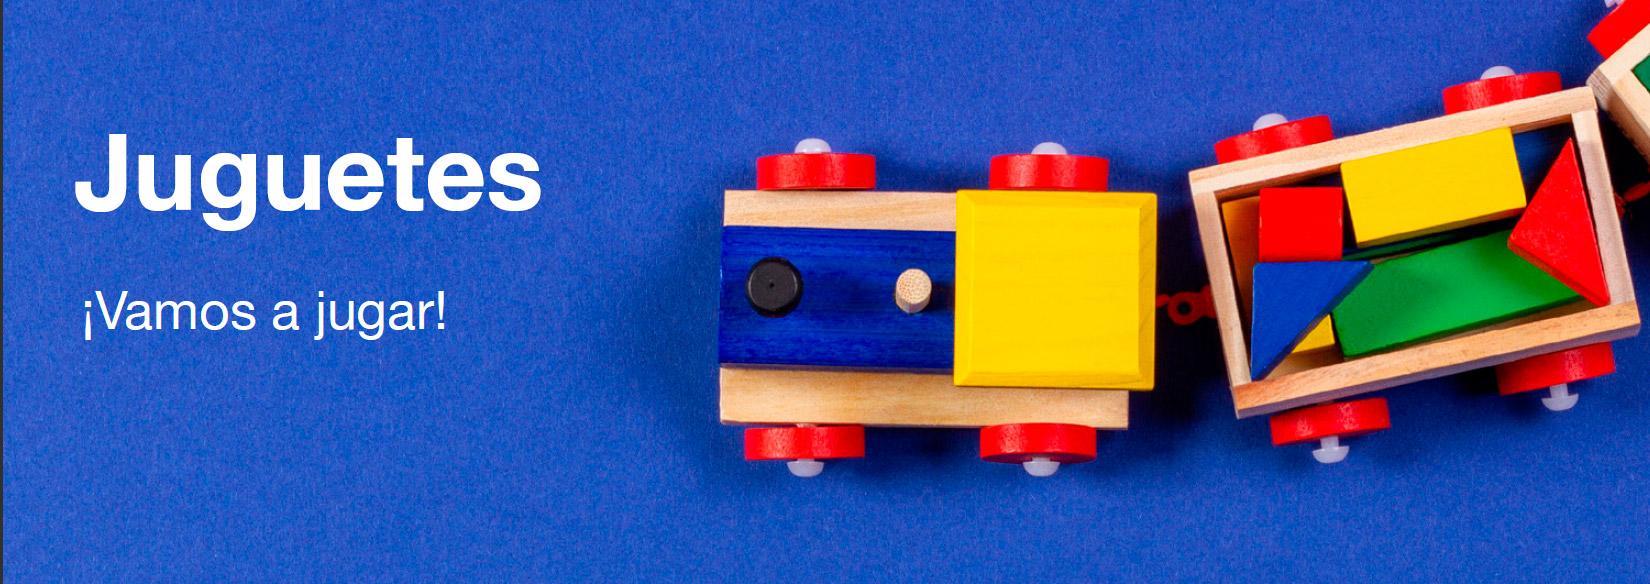 juguetes, munecas, lego, pre escolar, carros, peluches